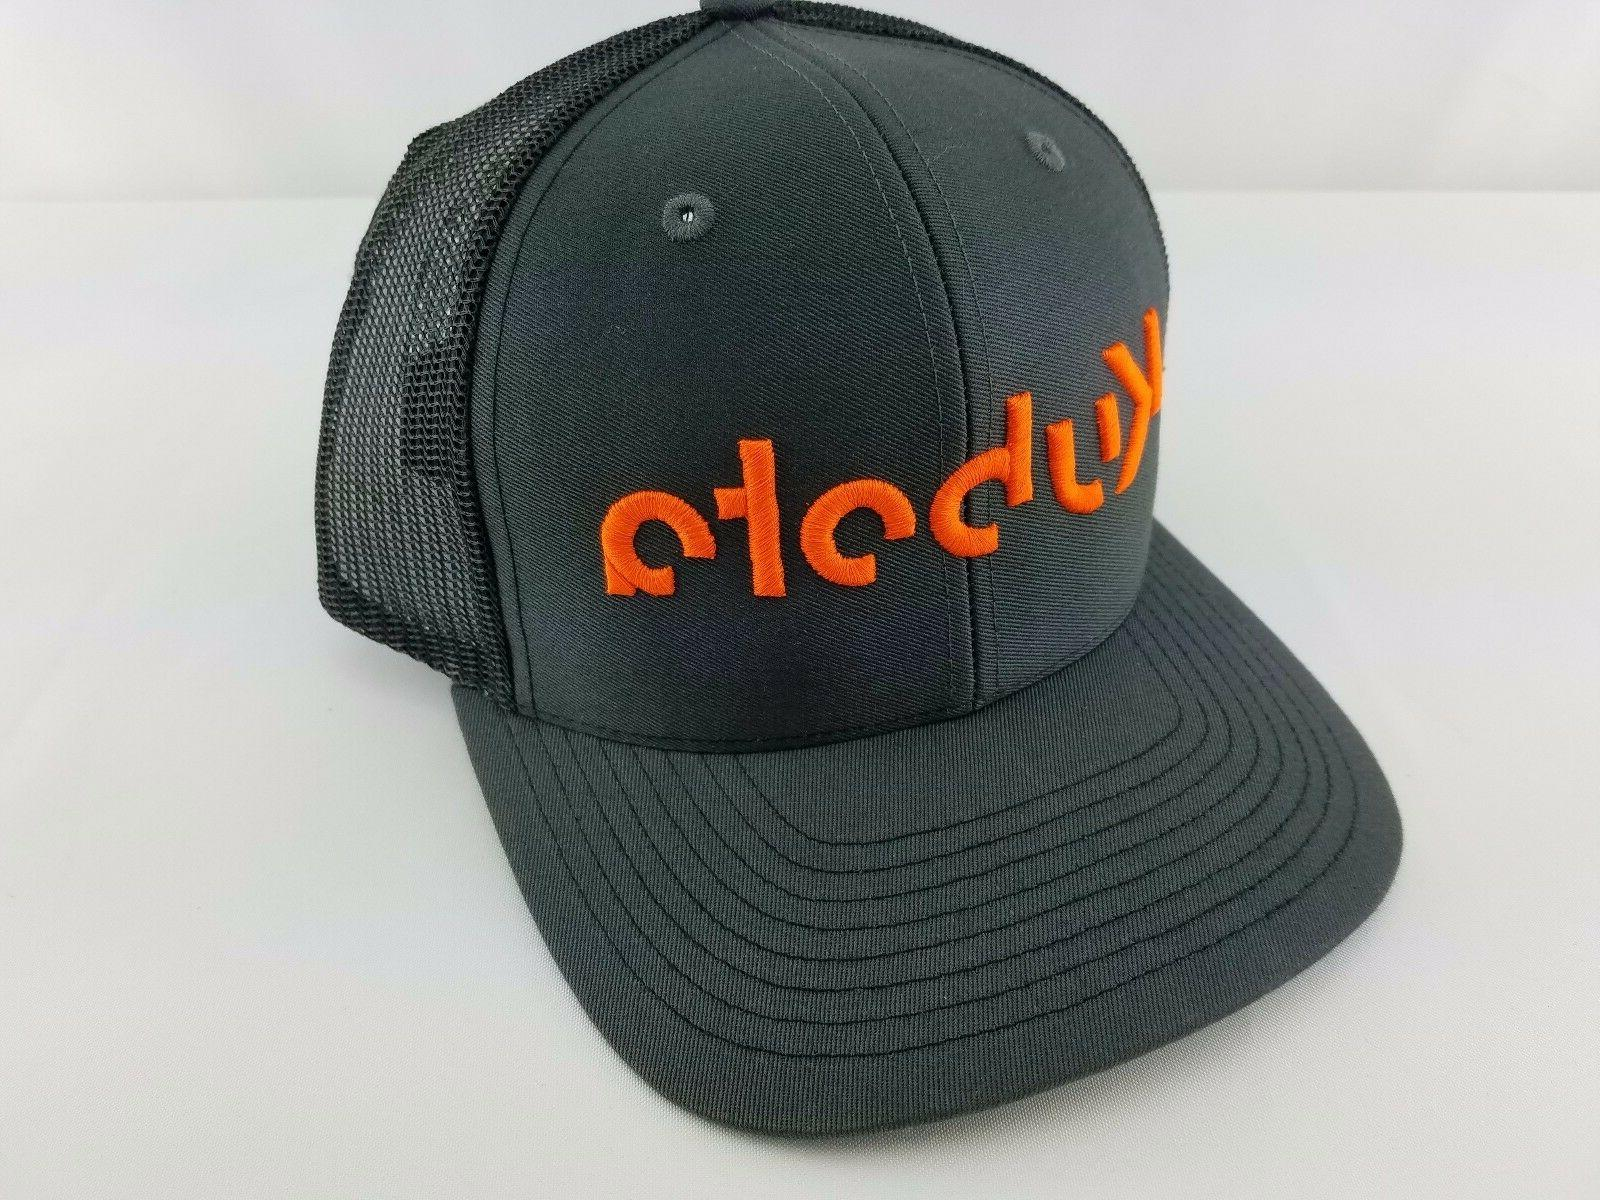 kubota trucker hat charcoal black cap hat